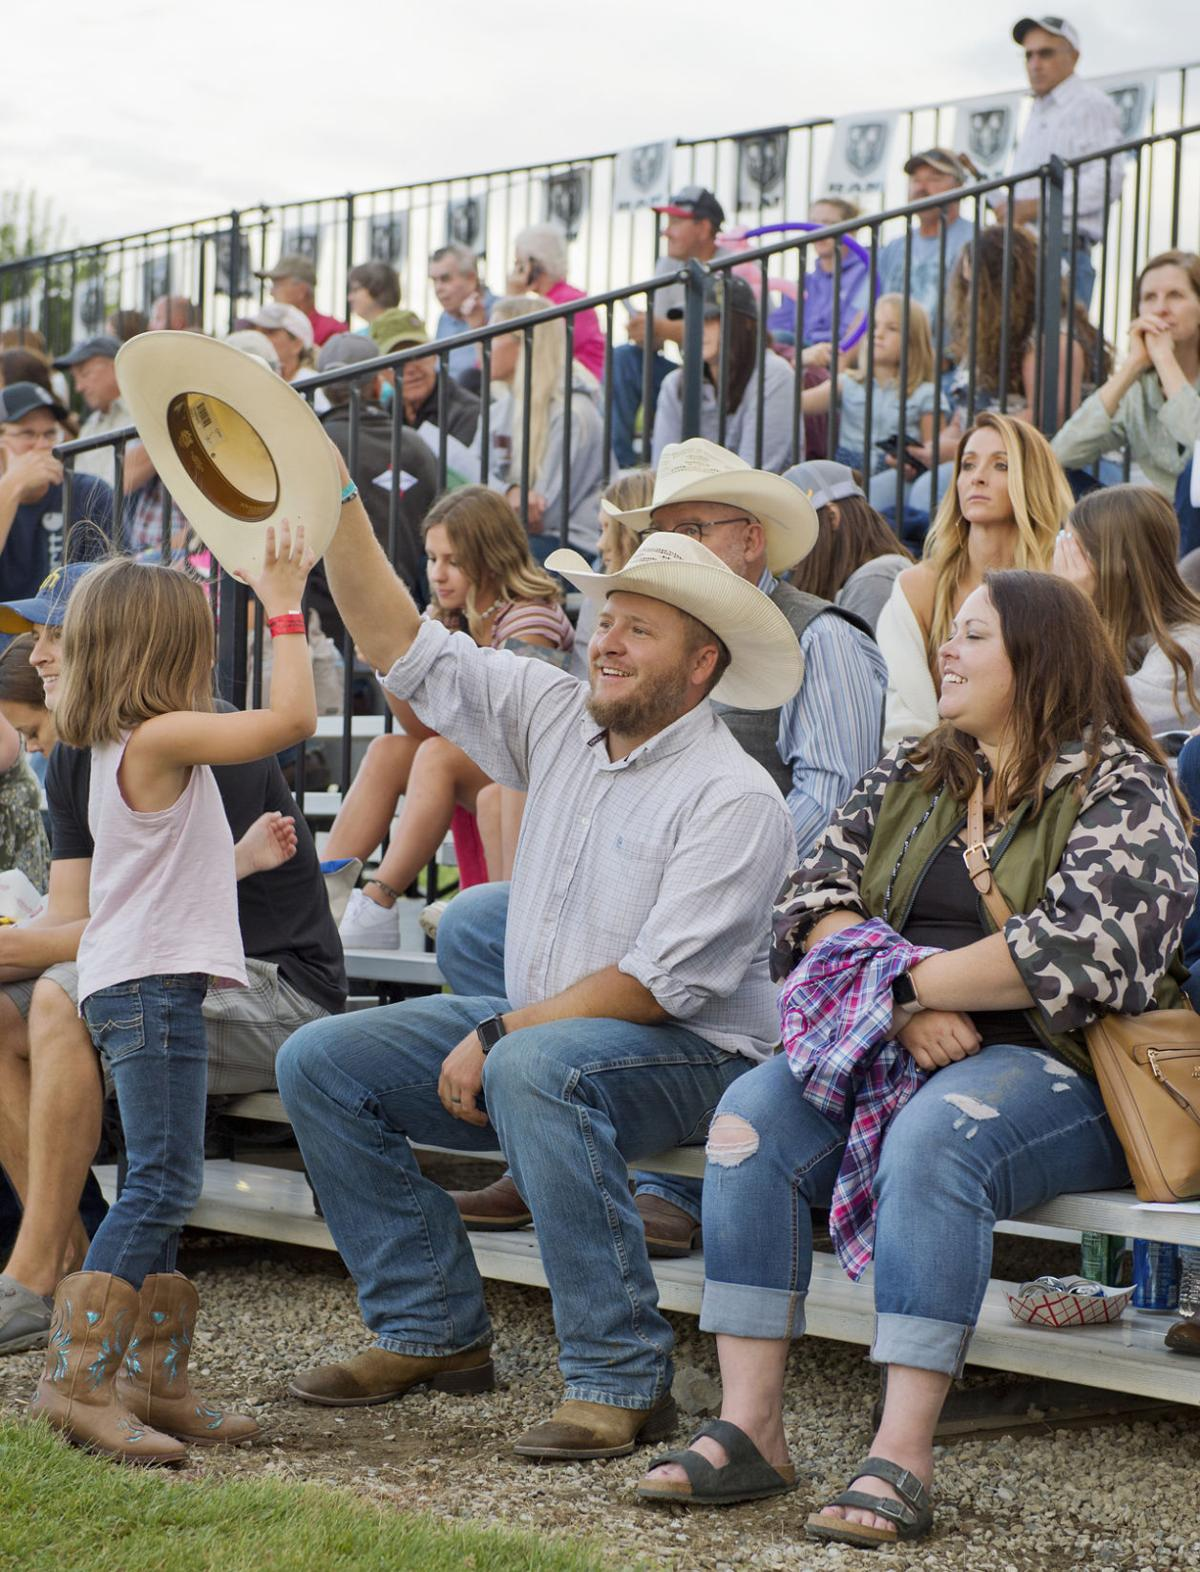 08_14_Yakima Co. Fair_Rodeo Photo_Cowboy Dad.jpg